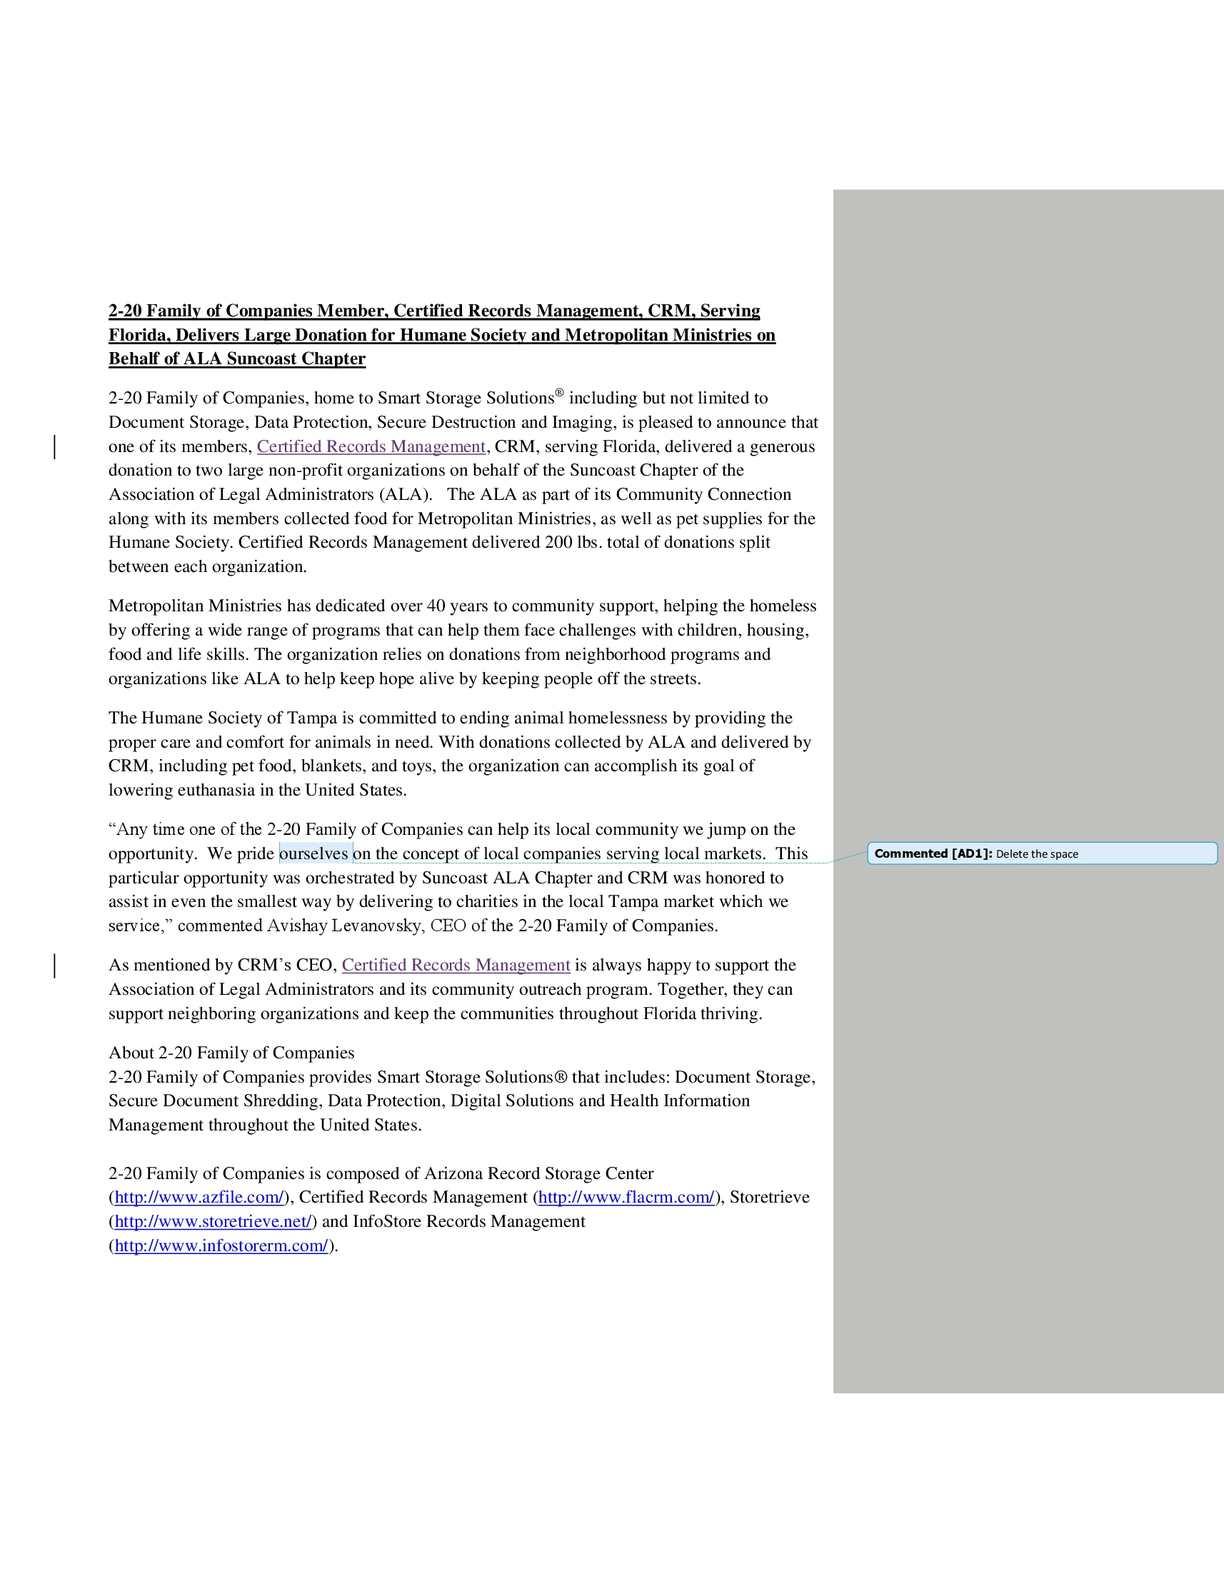 Calaméo - Certified Records Management